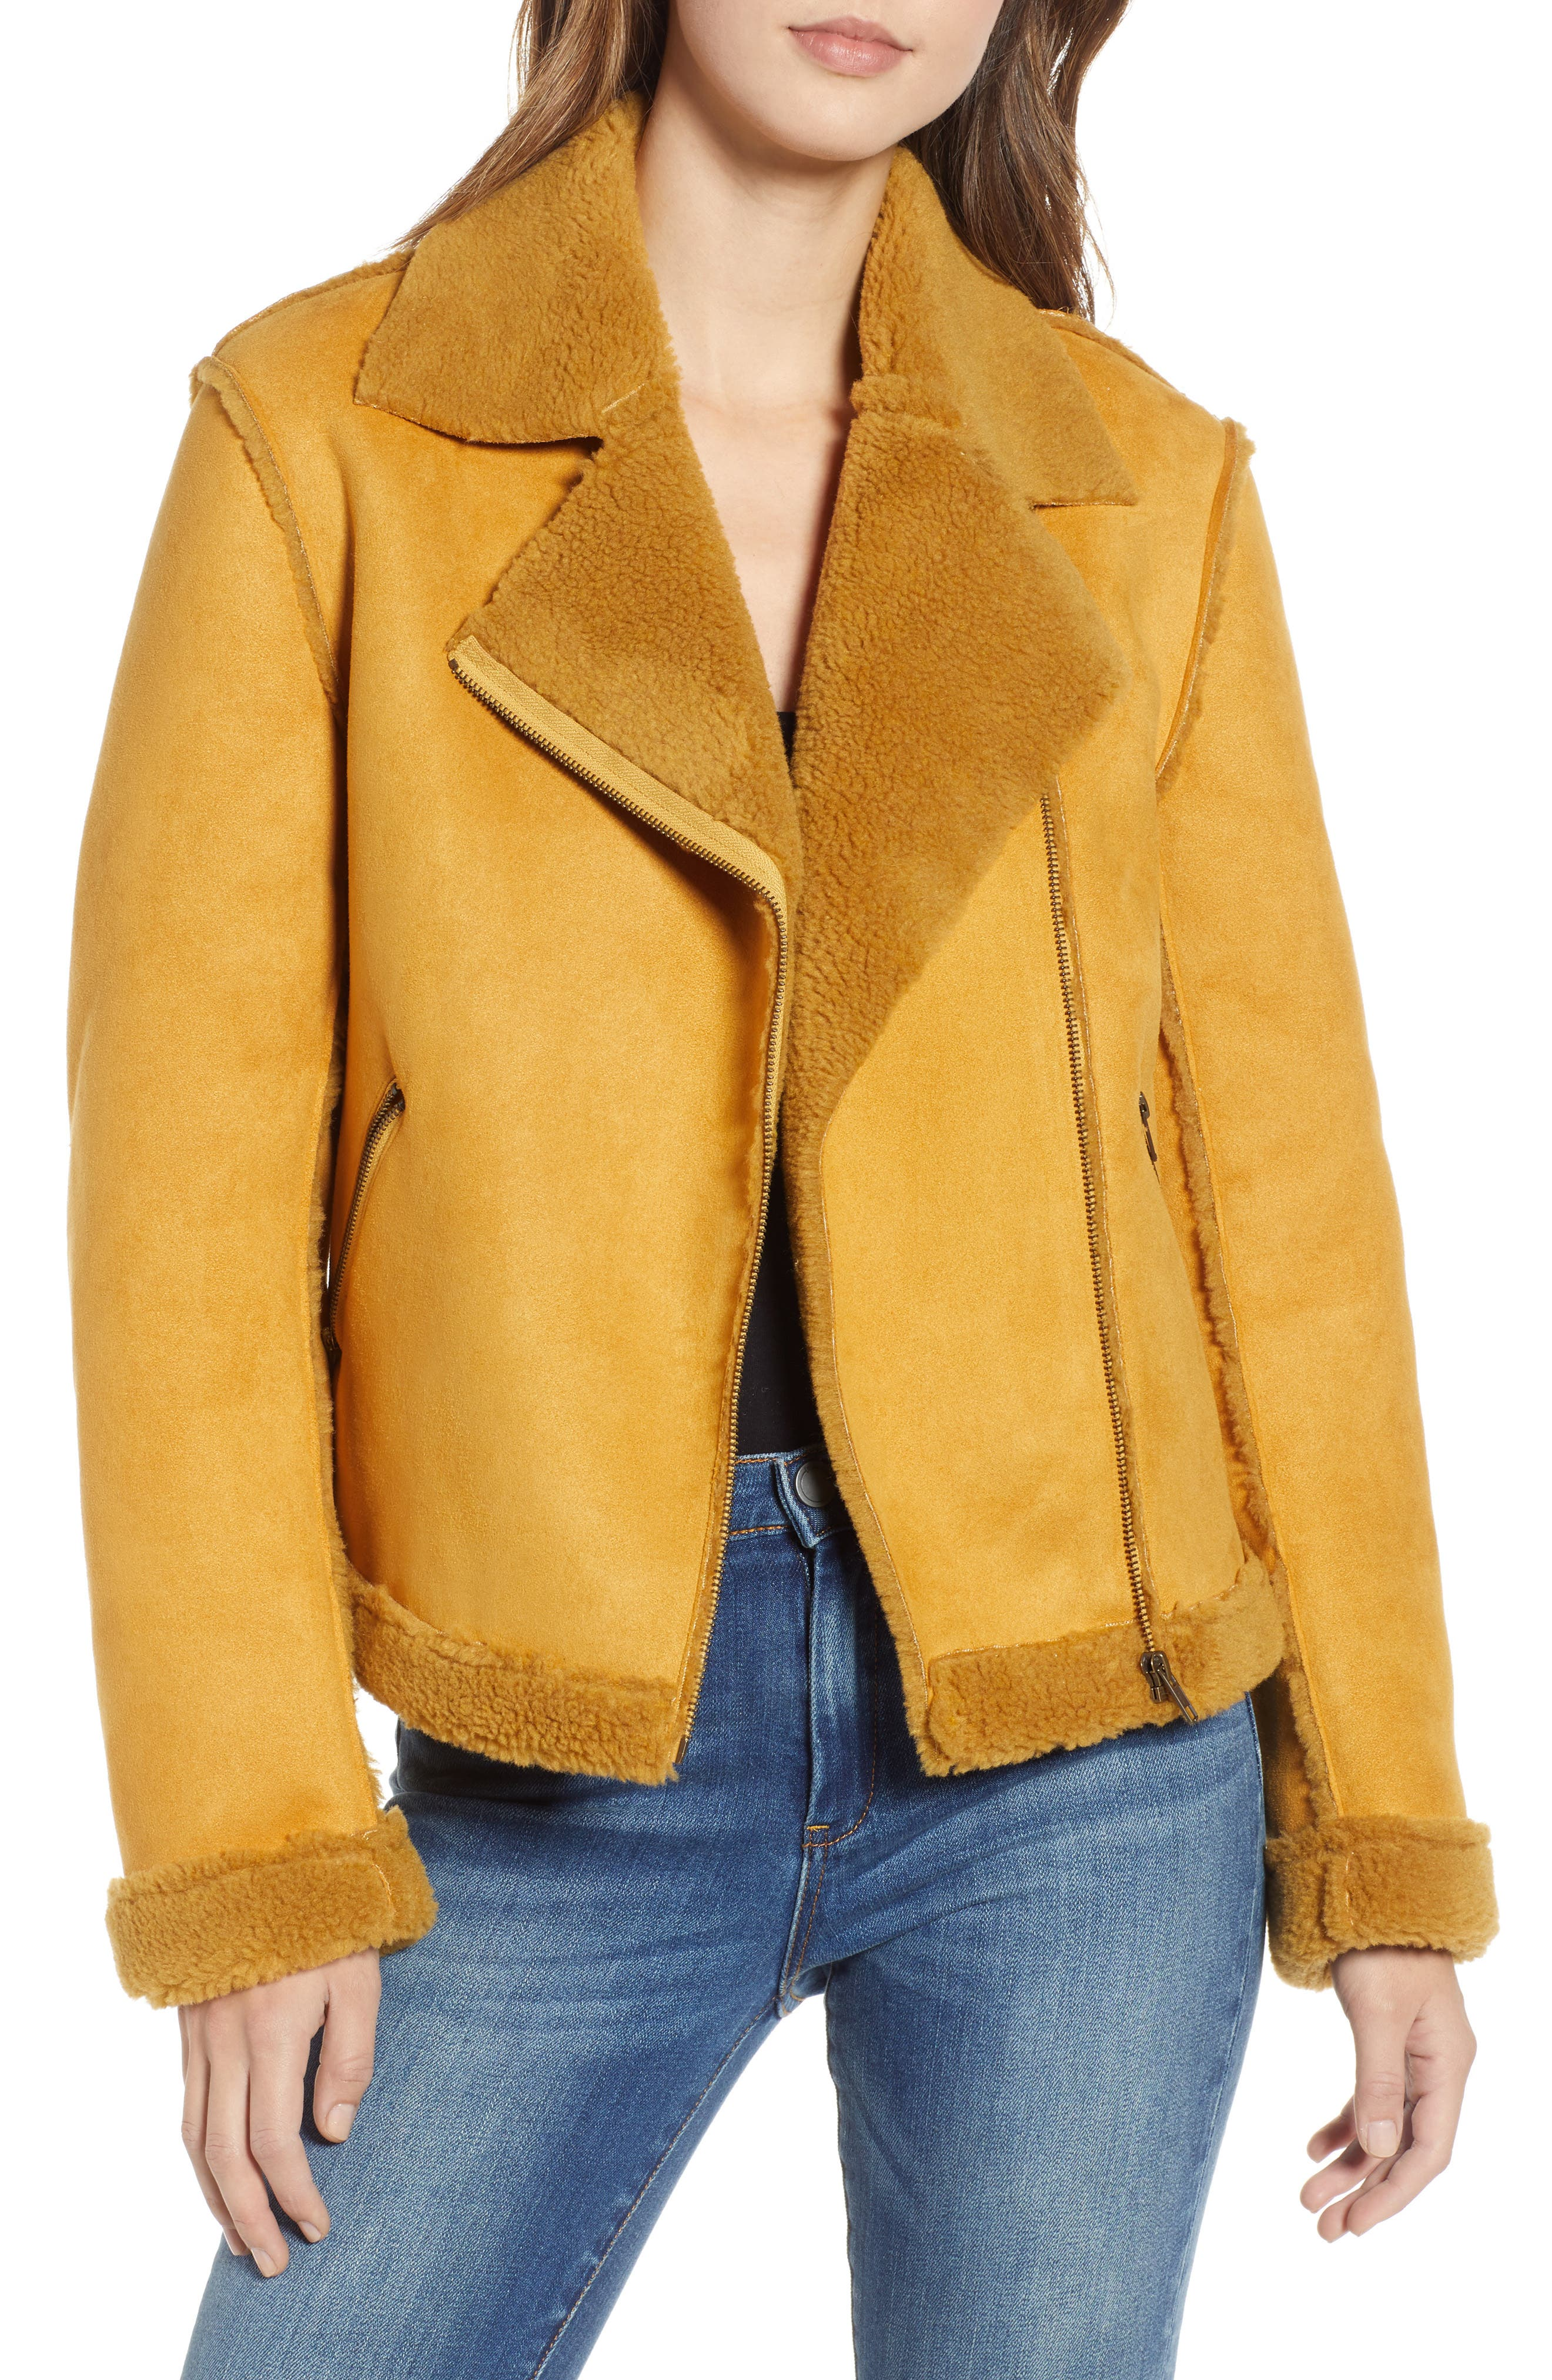 SOMEDAYS LOVIN Lovers Dance Faux Shearling Aviator Jacket in Golden Spice